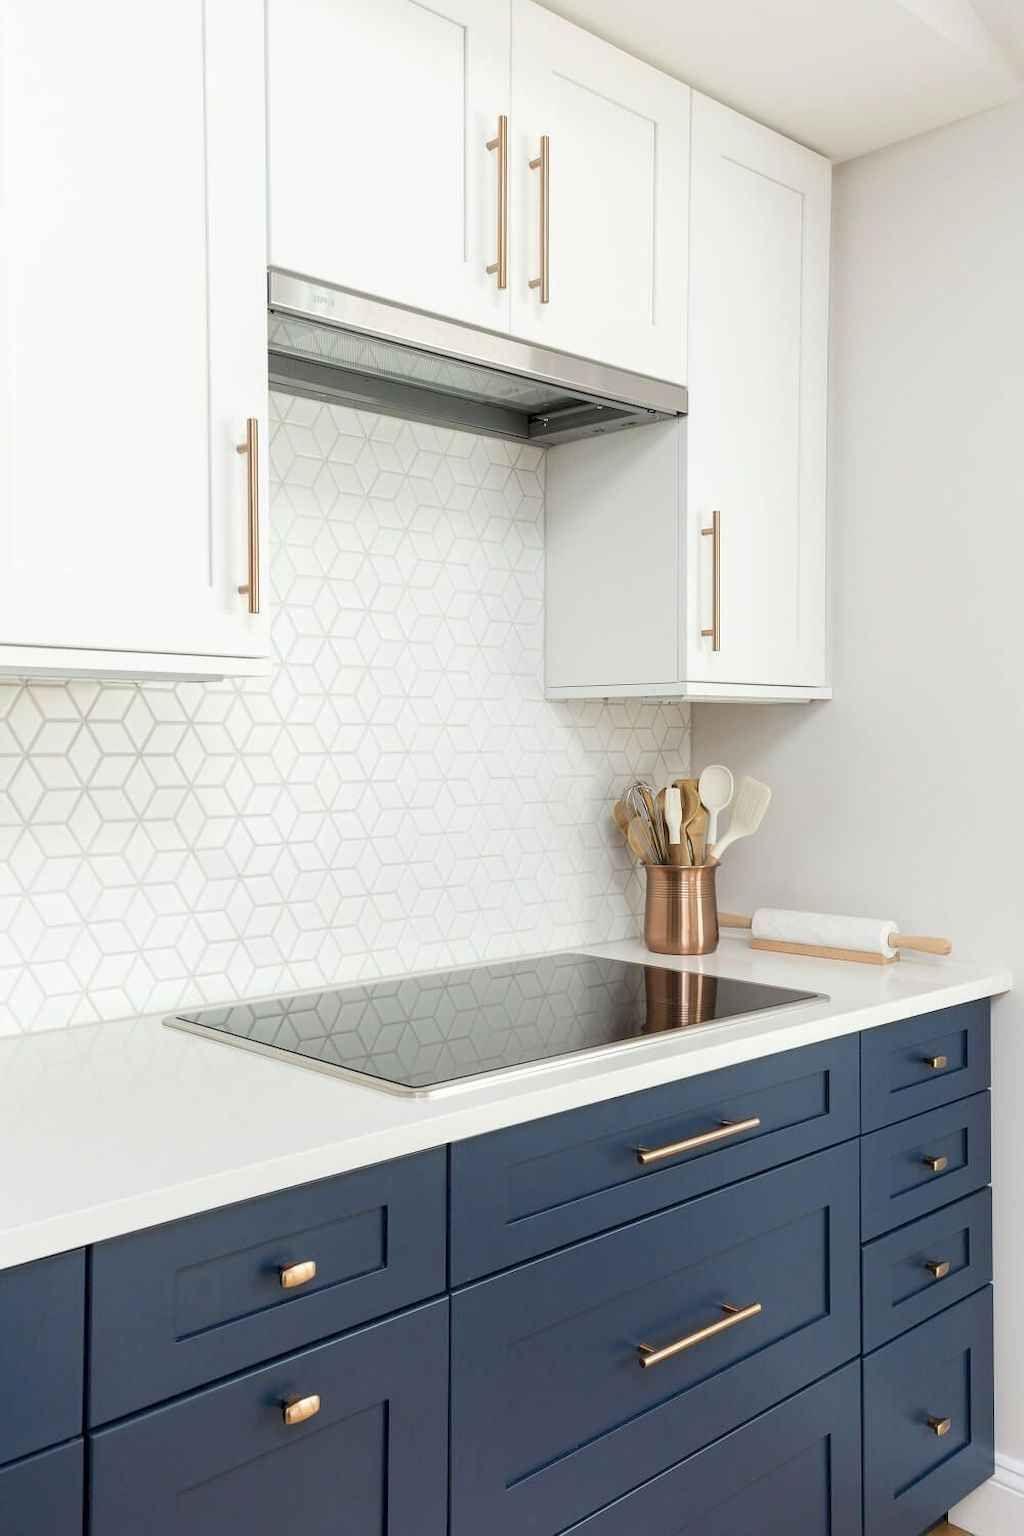 65 White Kitchen Cabinet Decor Ideas - Gladecor.com